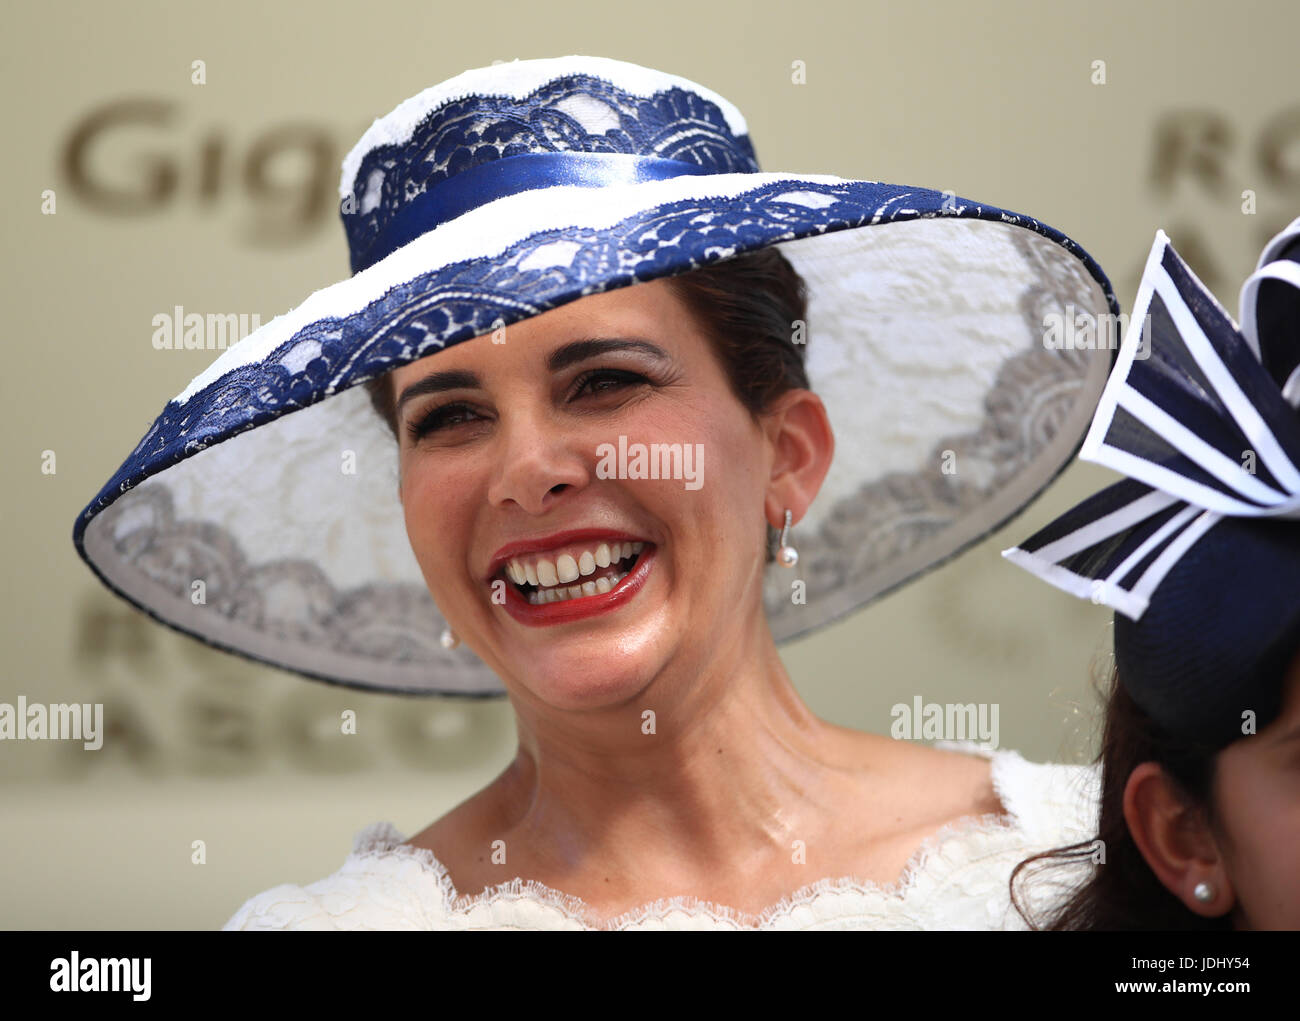 Fittest Arab Royalty • Health Fitness Revolution |Jordanian Princess Haya Bint Al Hussein